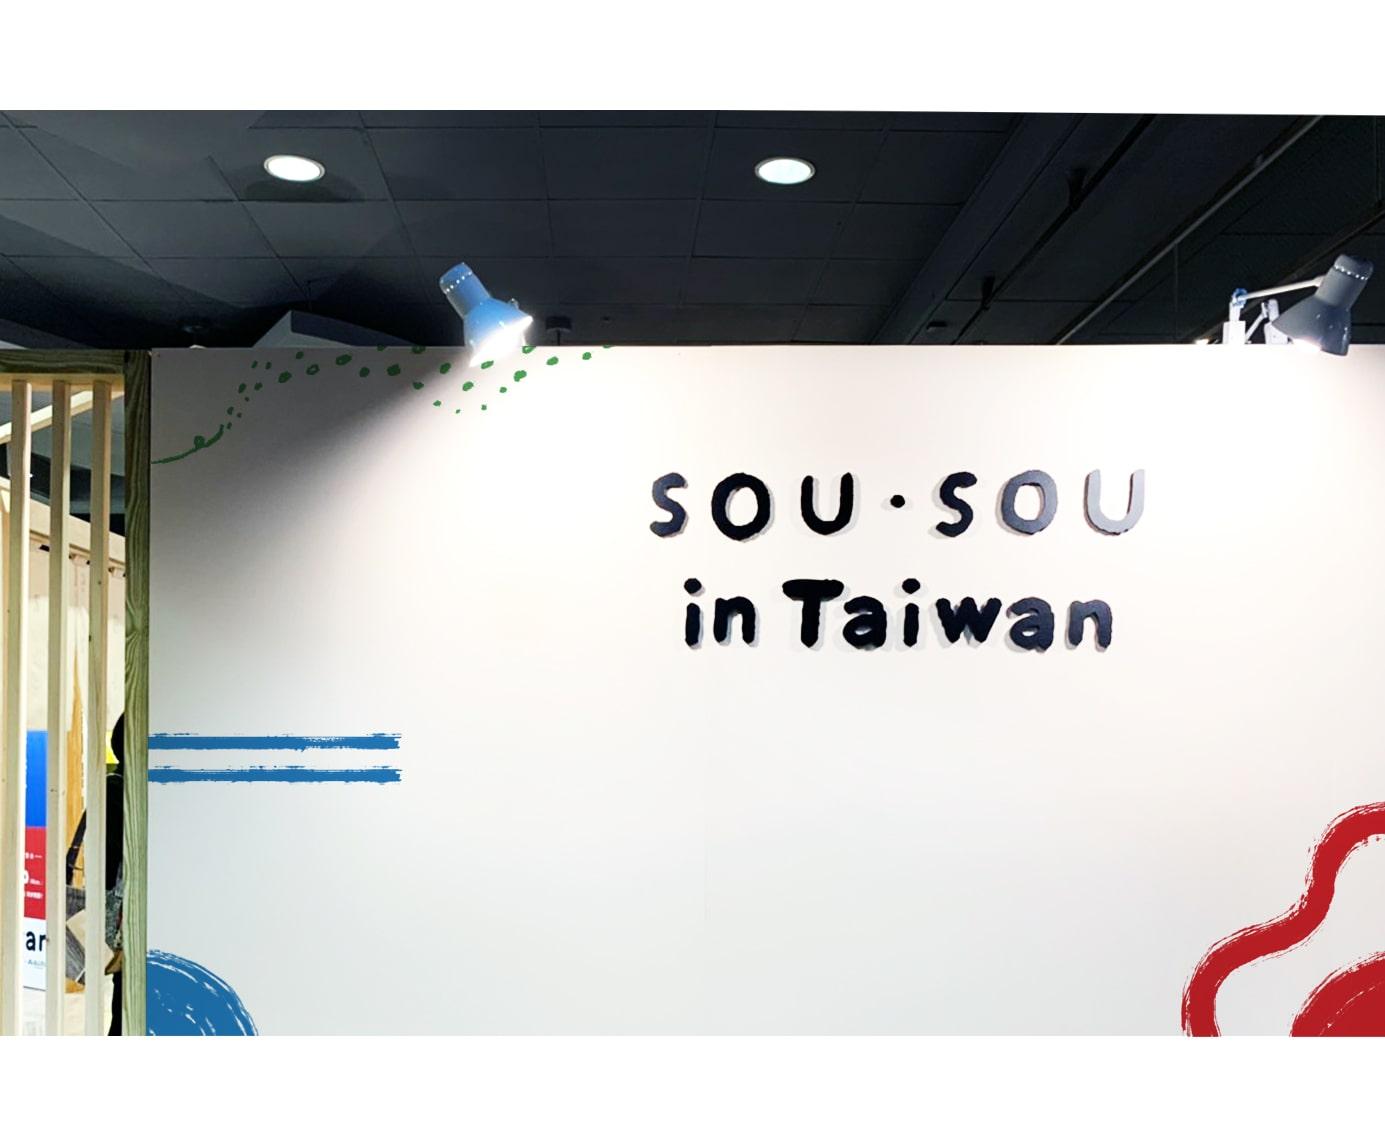 【SOU・SOU X 誠品現場直擊】期間限定優惠,誠品網路書店也同步!